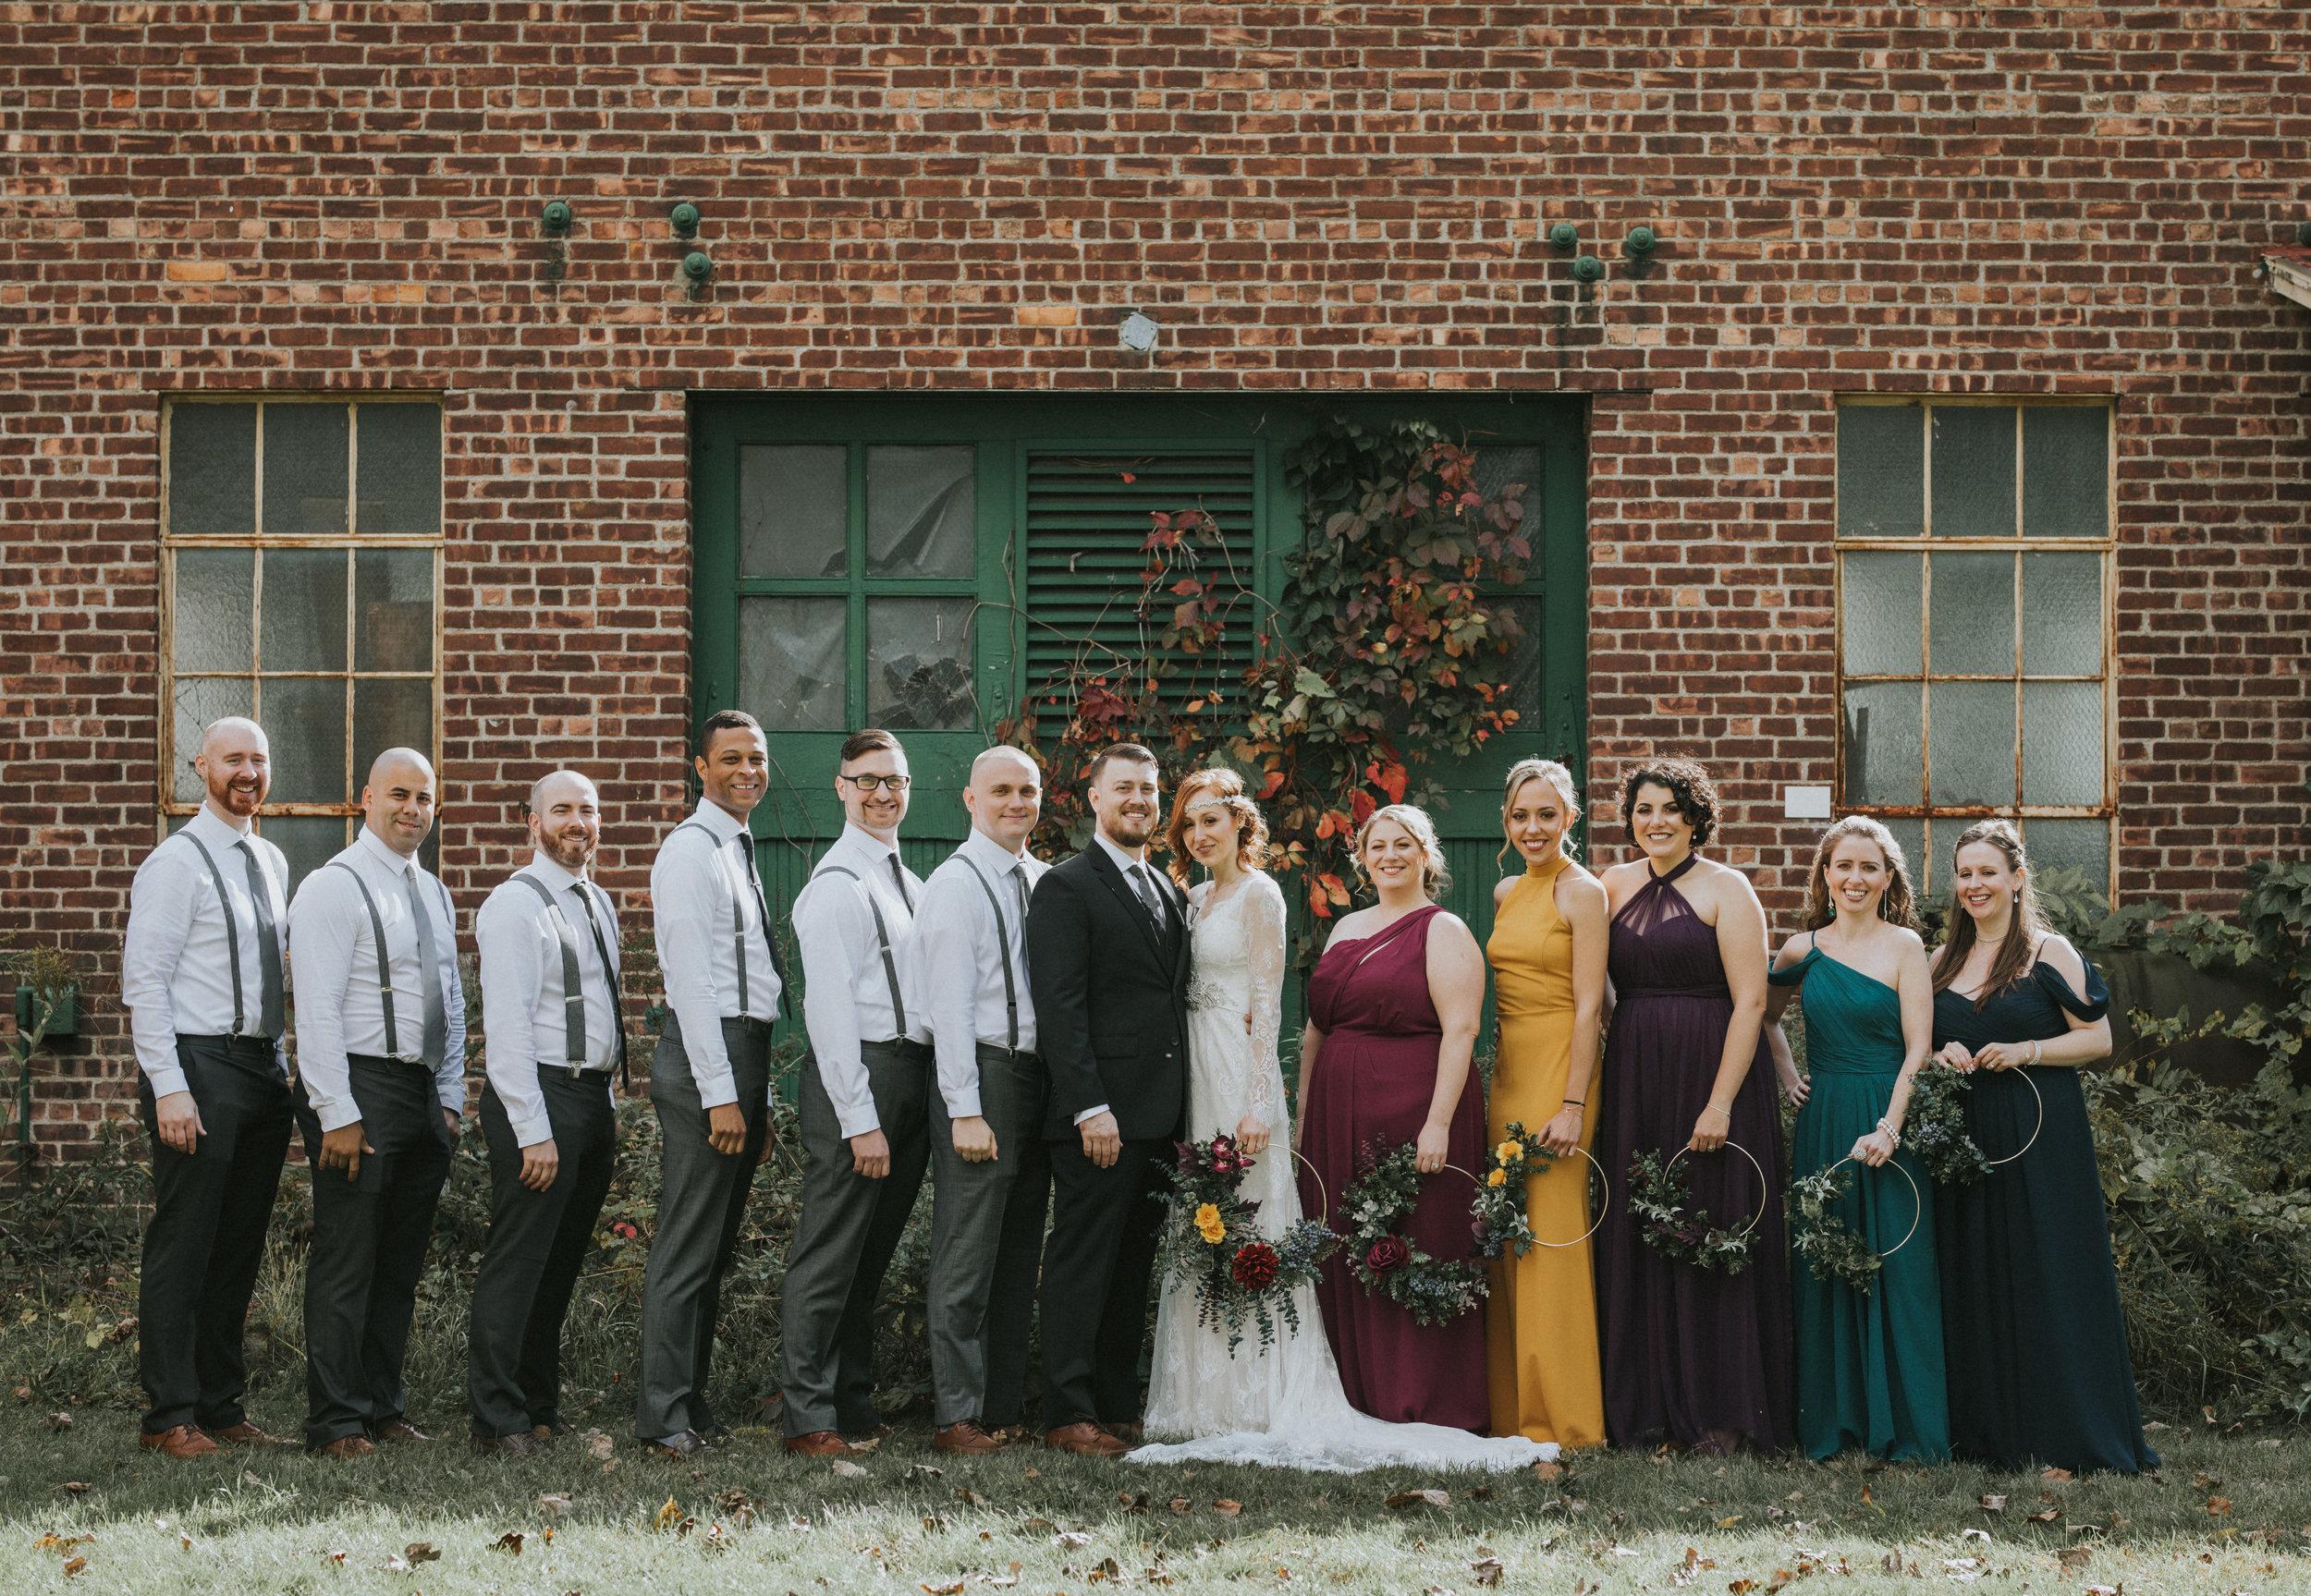 shaker_heritage_barn_wedding_005.jpg